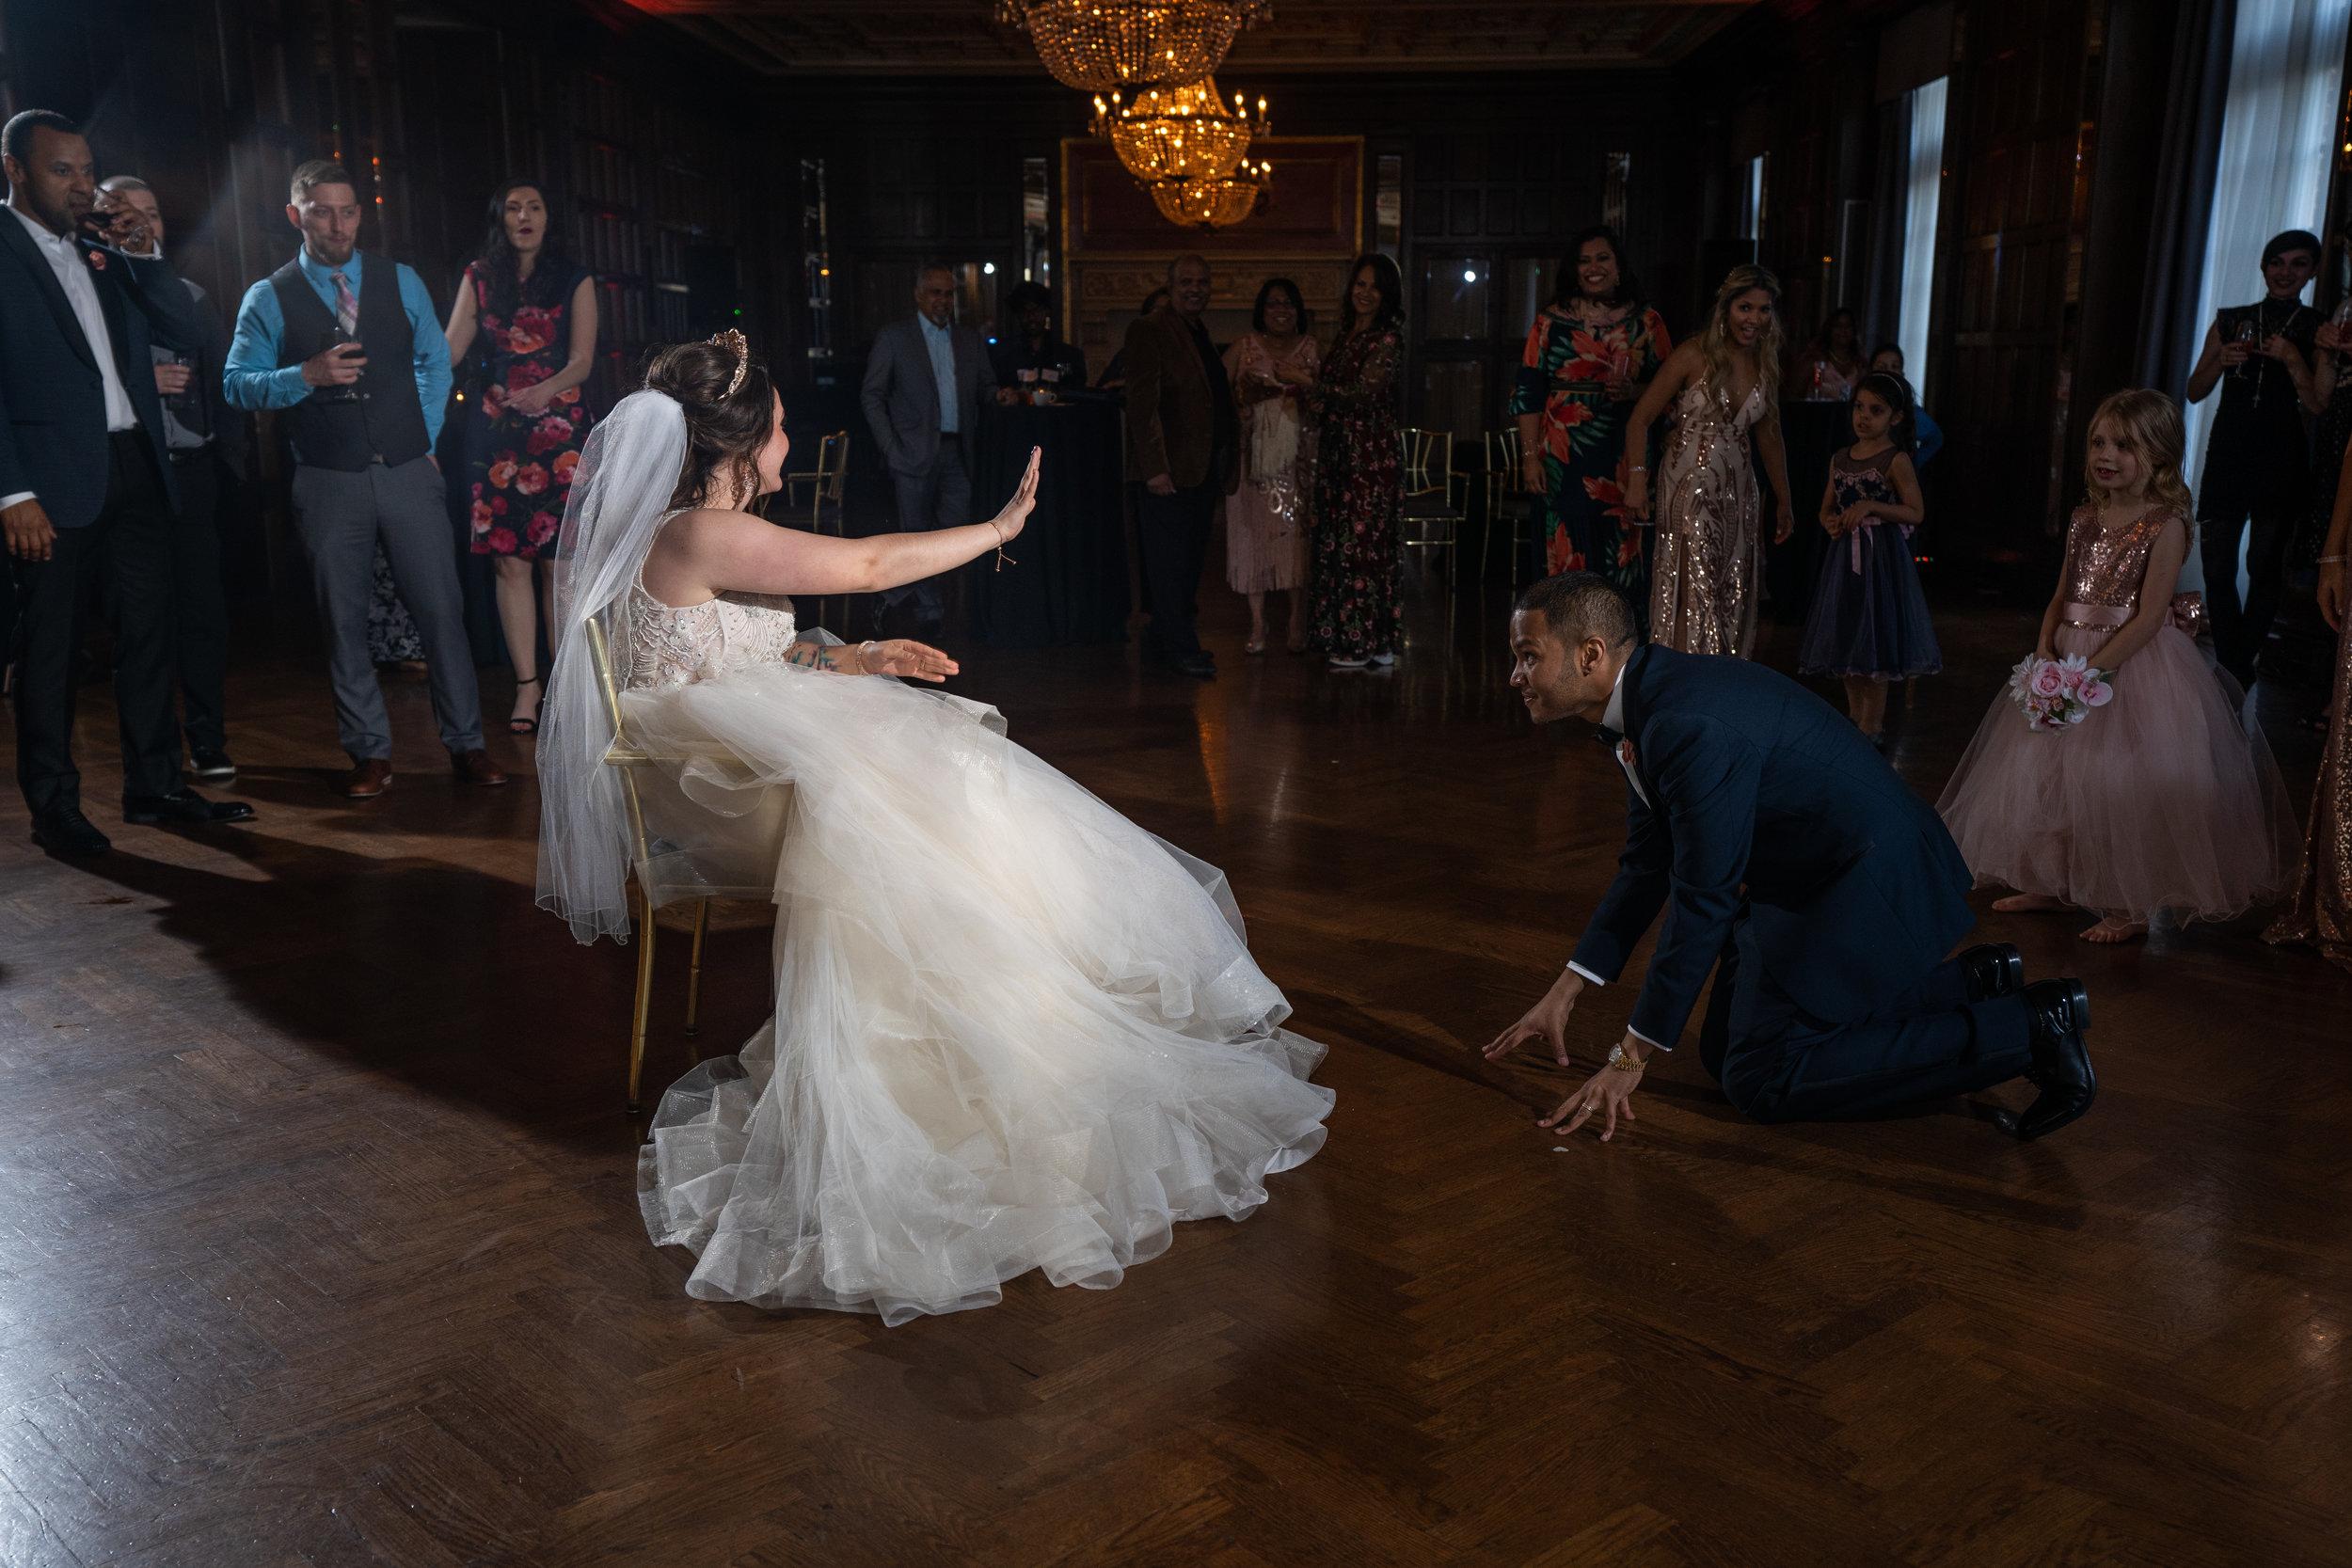 Bear Creative Co, Columbus Ohio Photographer, Columbus Ohio Wedding Photographer, Nashville Wedding, The Athletic Club of Columbus, Columbus Ohio